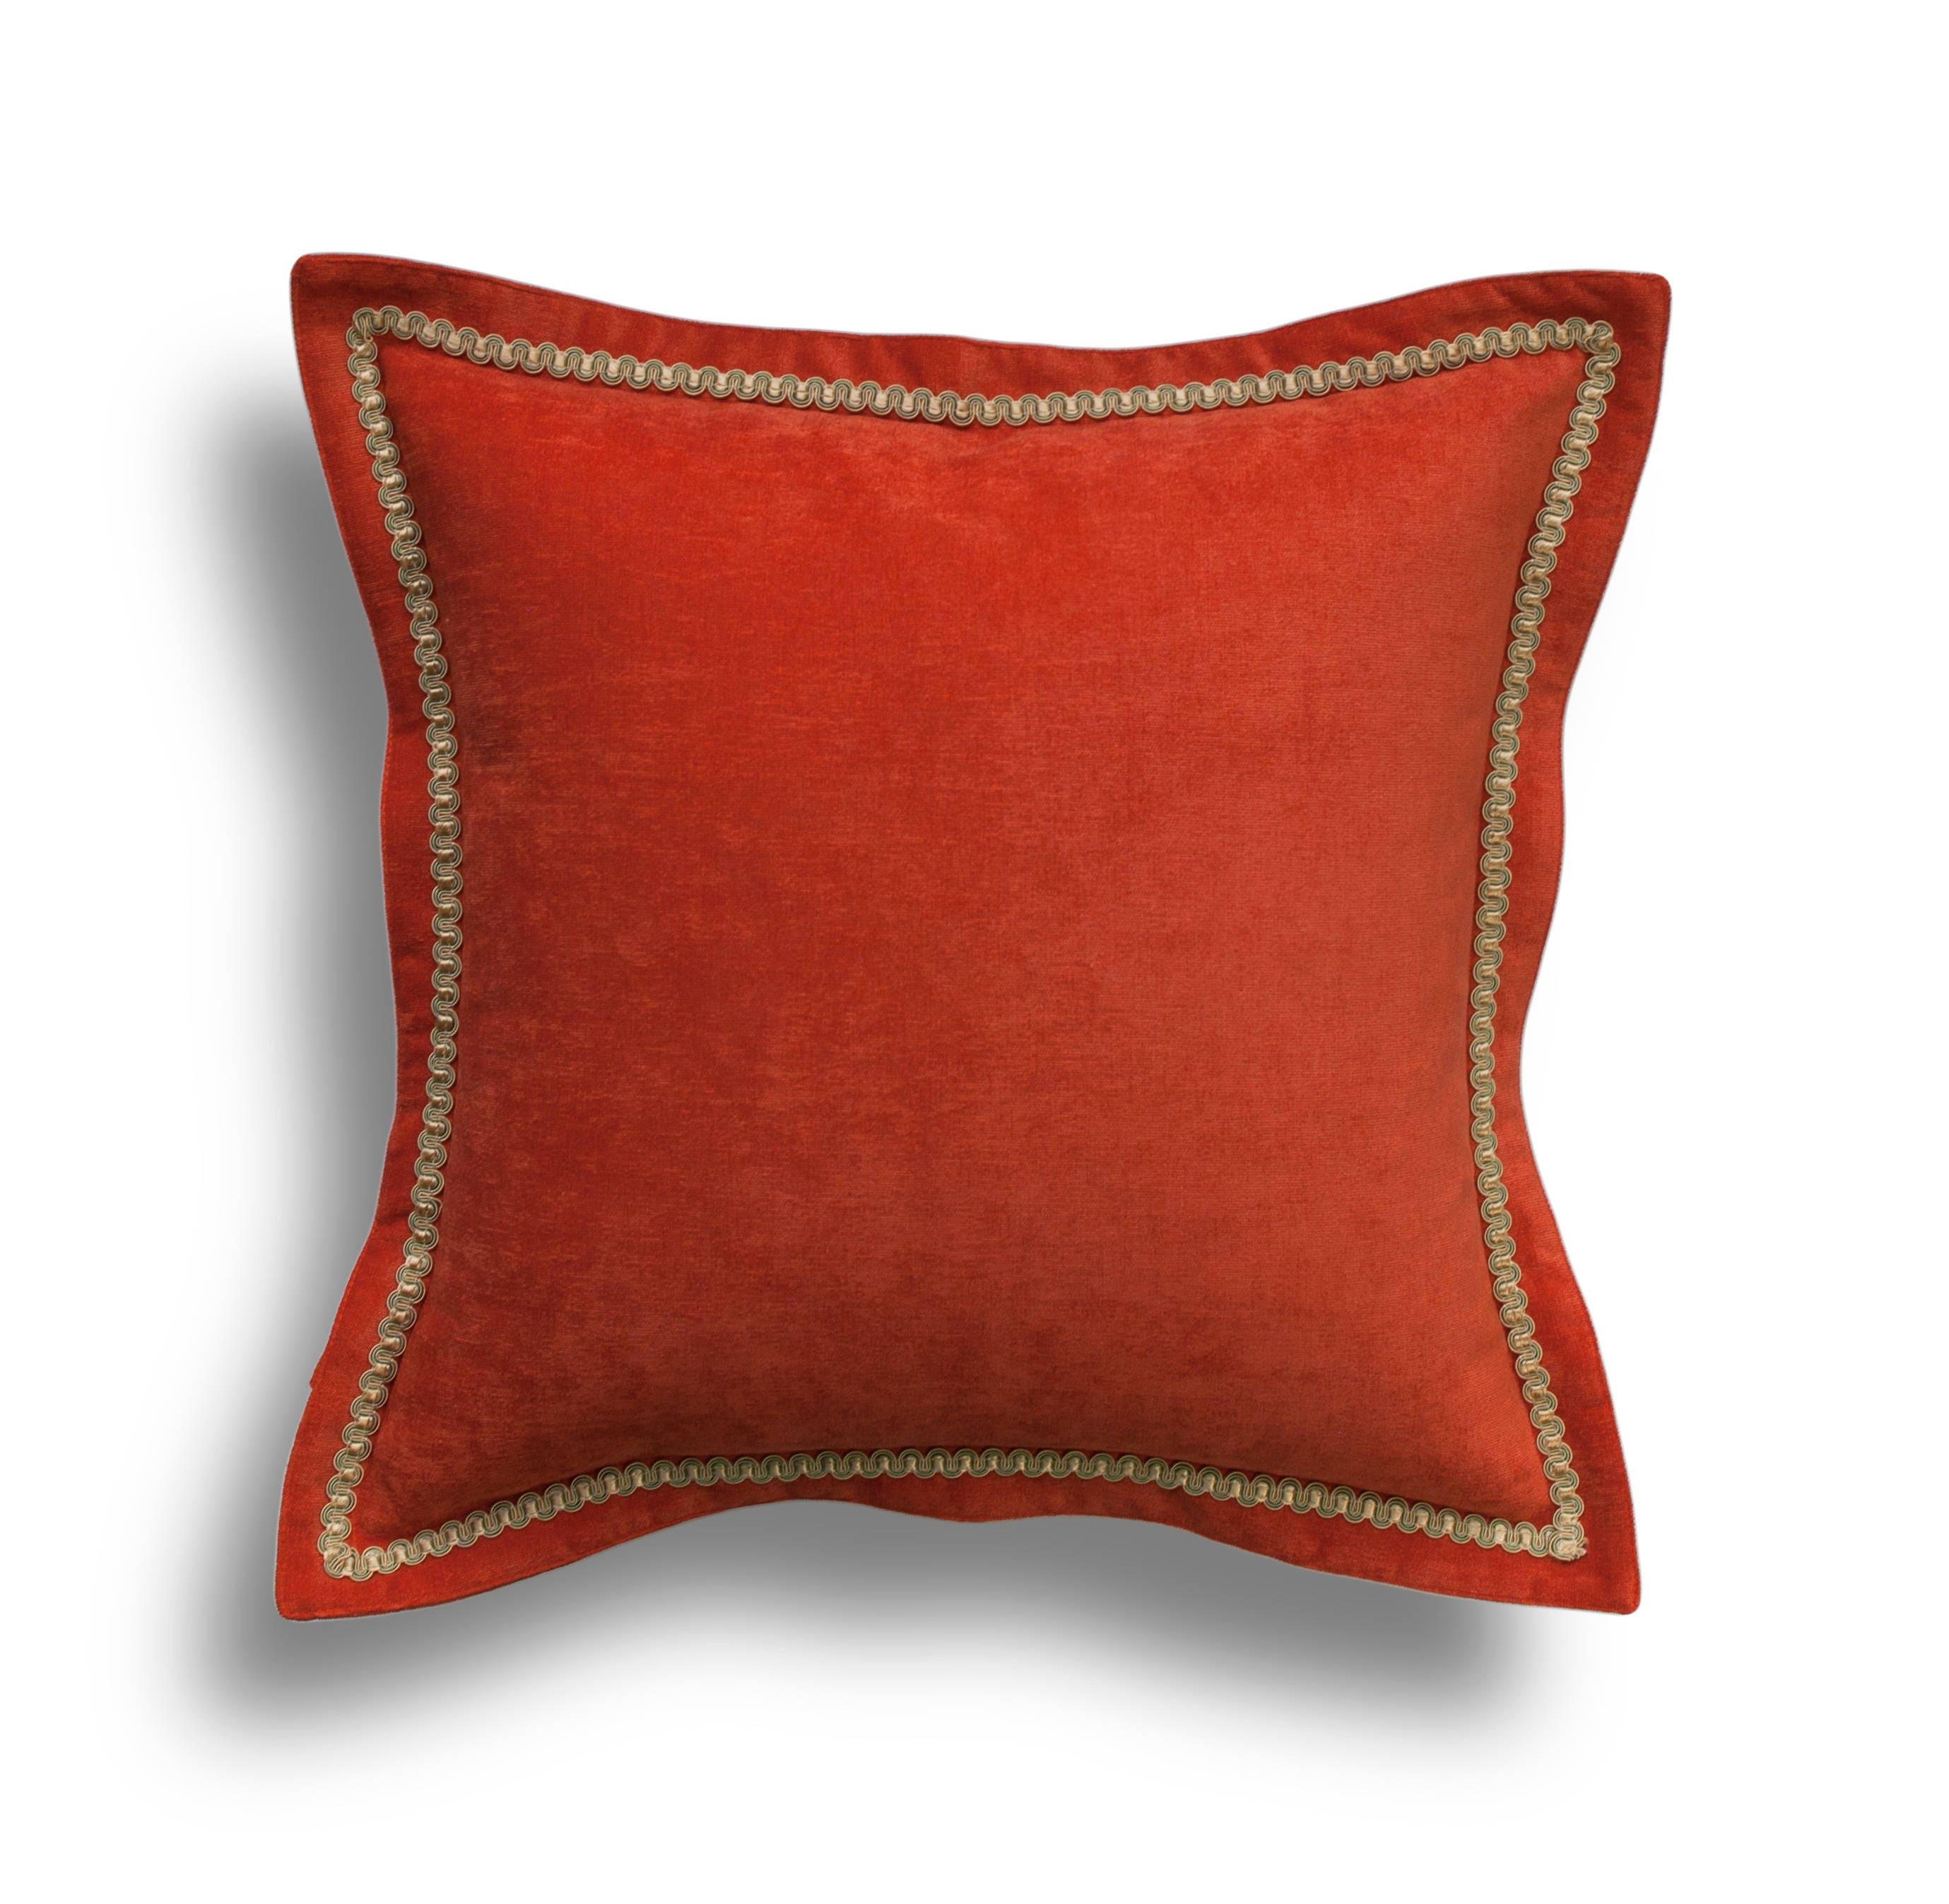 Orange Velvet Throw Pillow Cover Orange Pillow Cover ~ Red Throw Pillows For Sofa